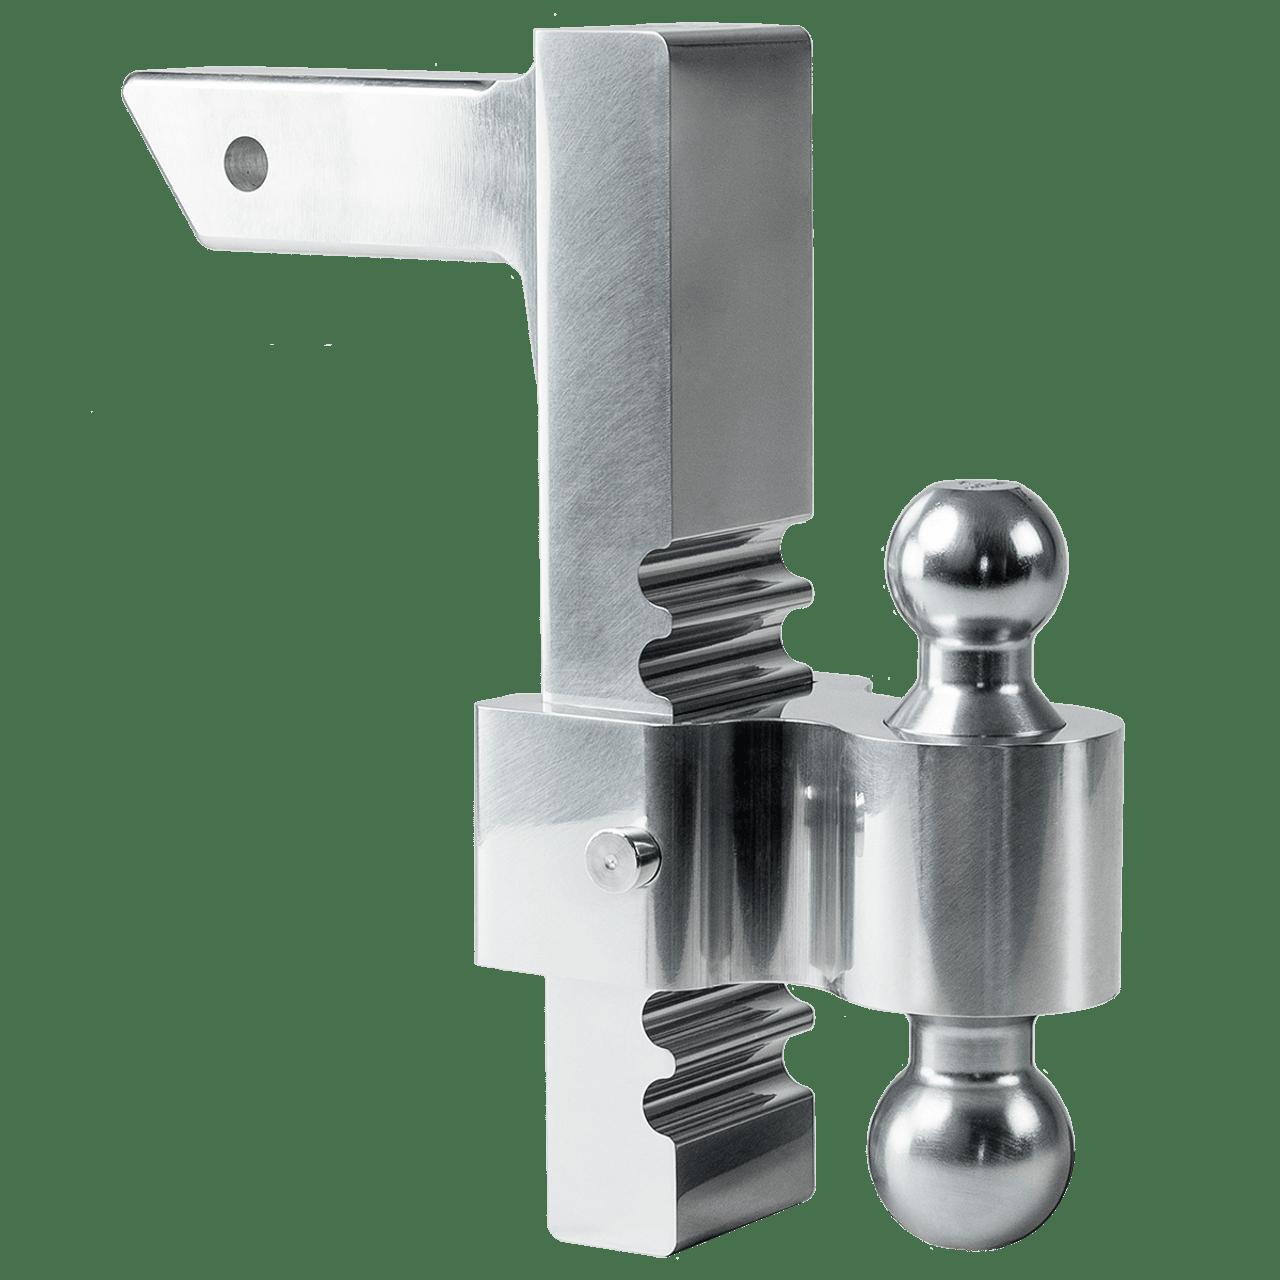 3413 --- Rapid Hitch Adjustable Aluminum Double Ball Mount